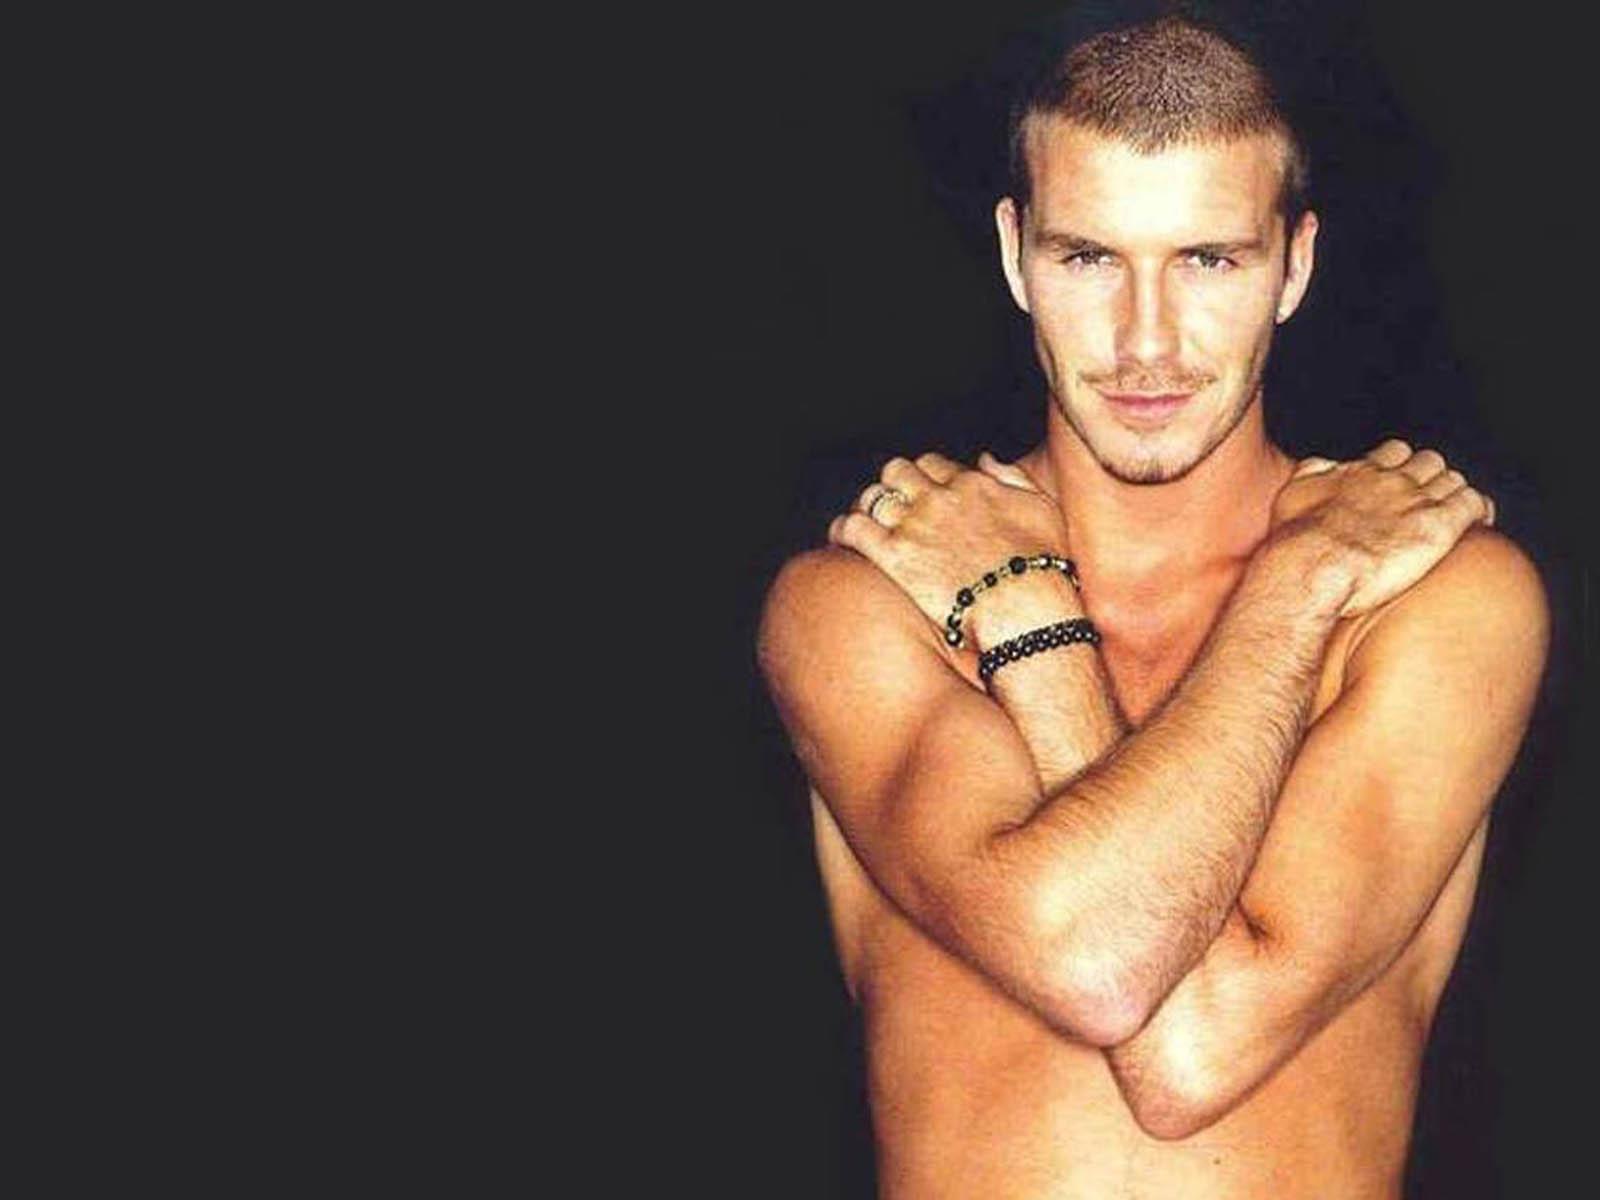 David Beckham Desktop Backgrounds, David Beckham Photos,david Beckham